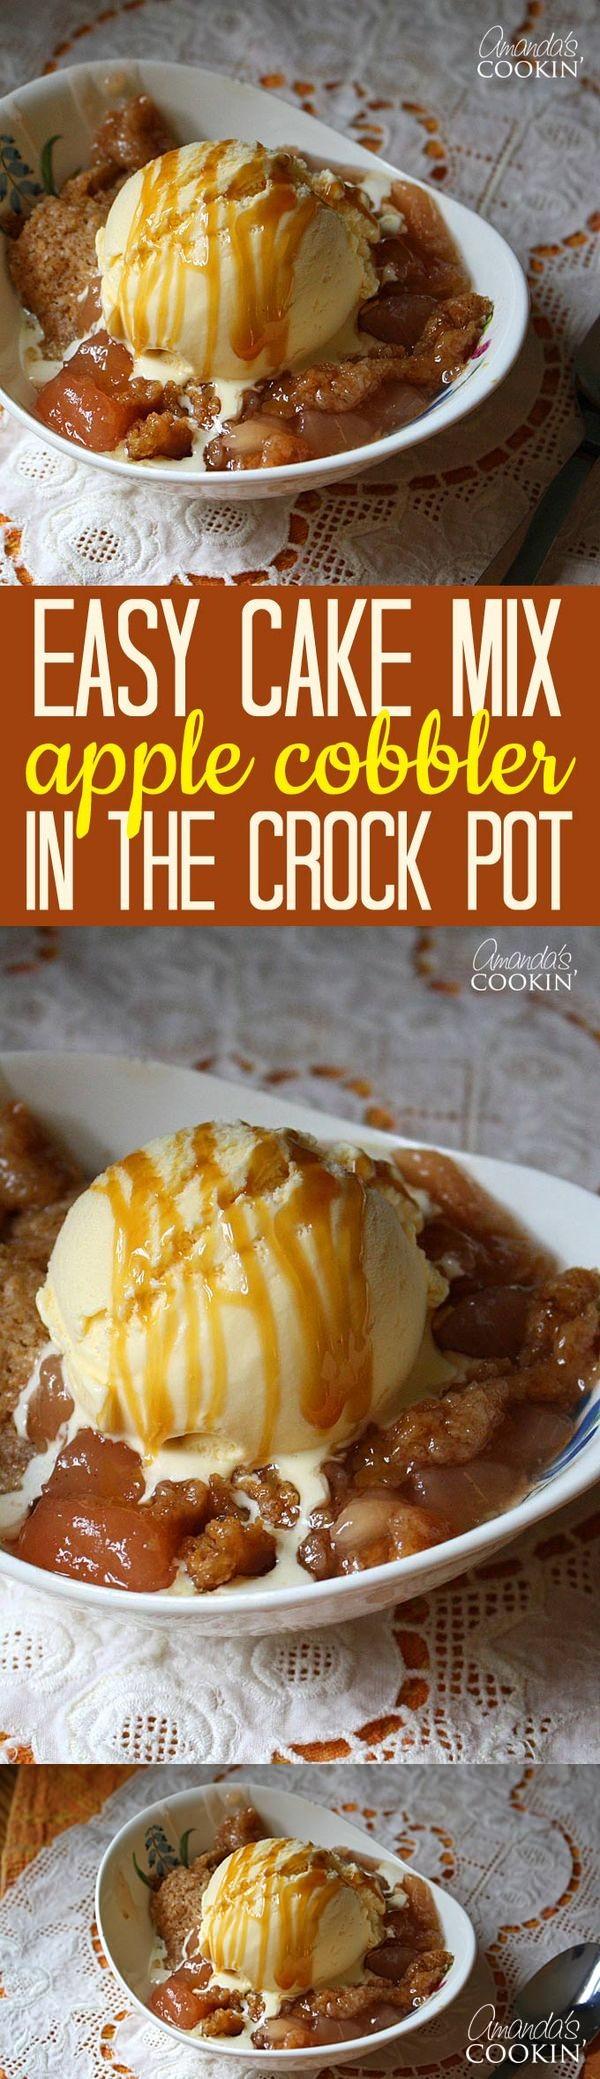 Cake Mix Apple Cobbler in the CrockPot